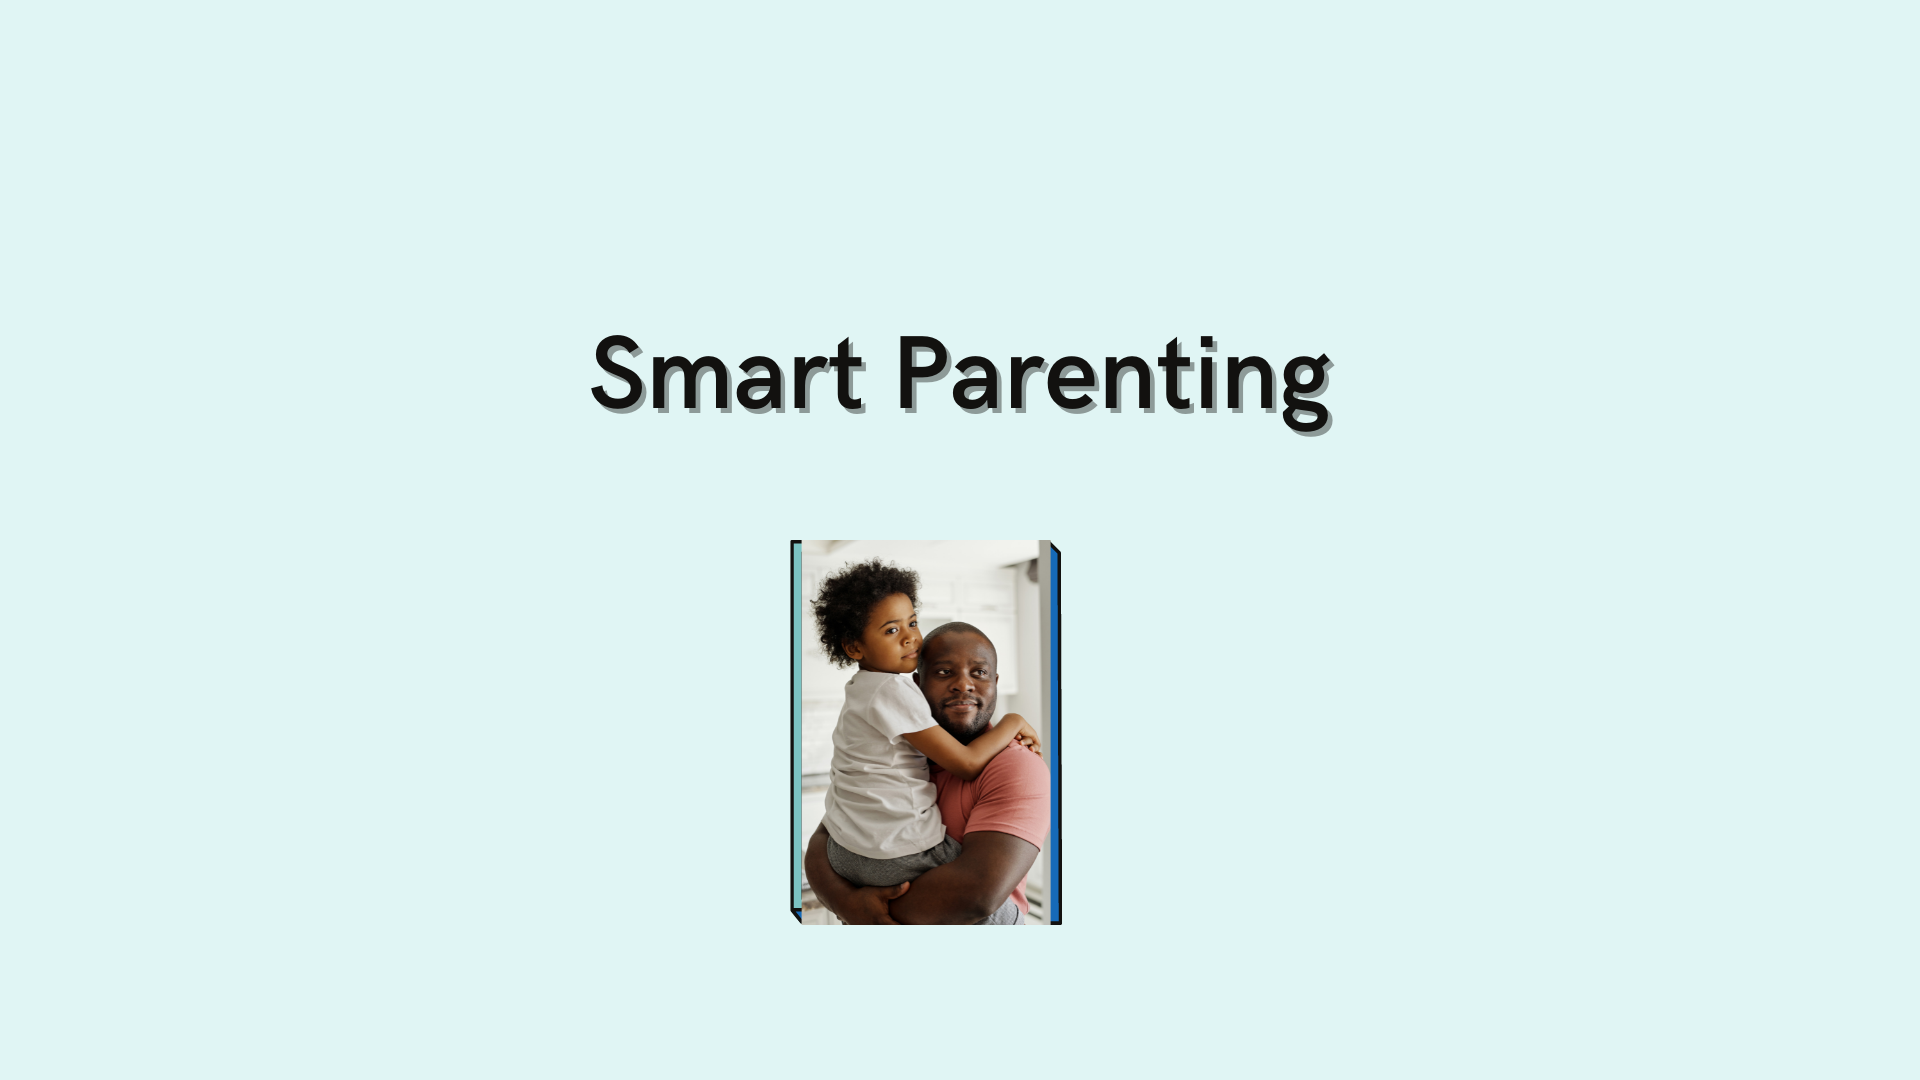 Smart Parenting: How to Nurture Your Child